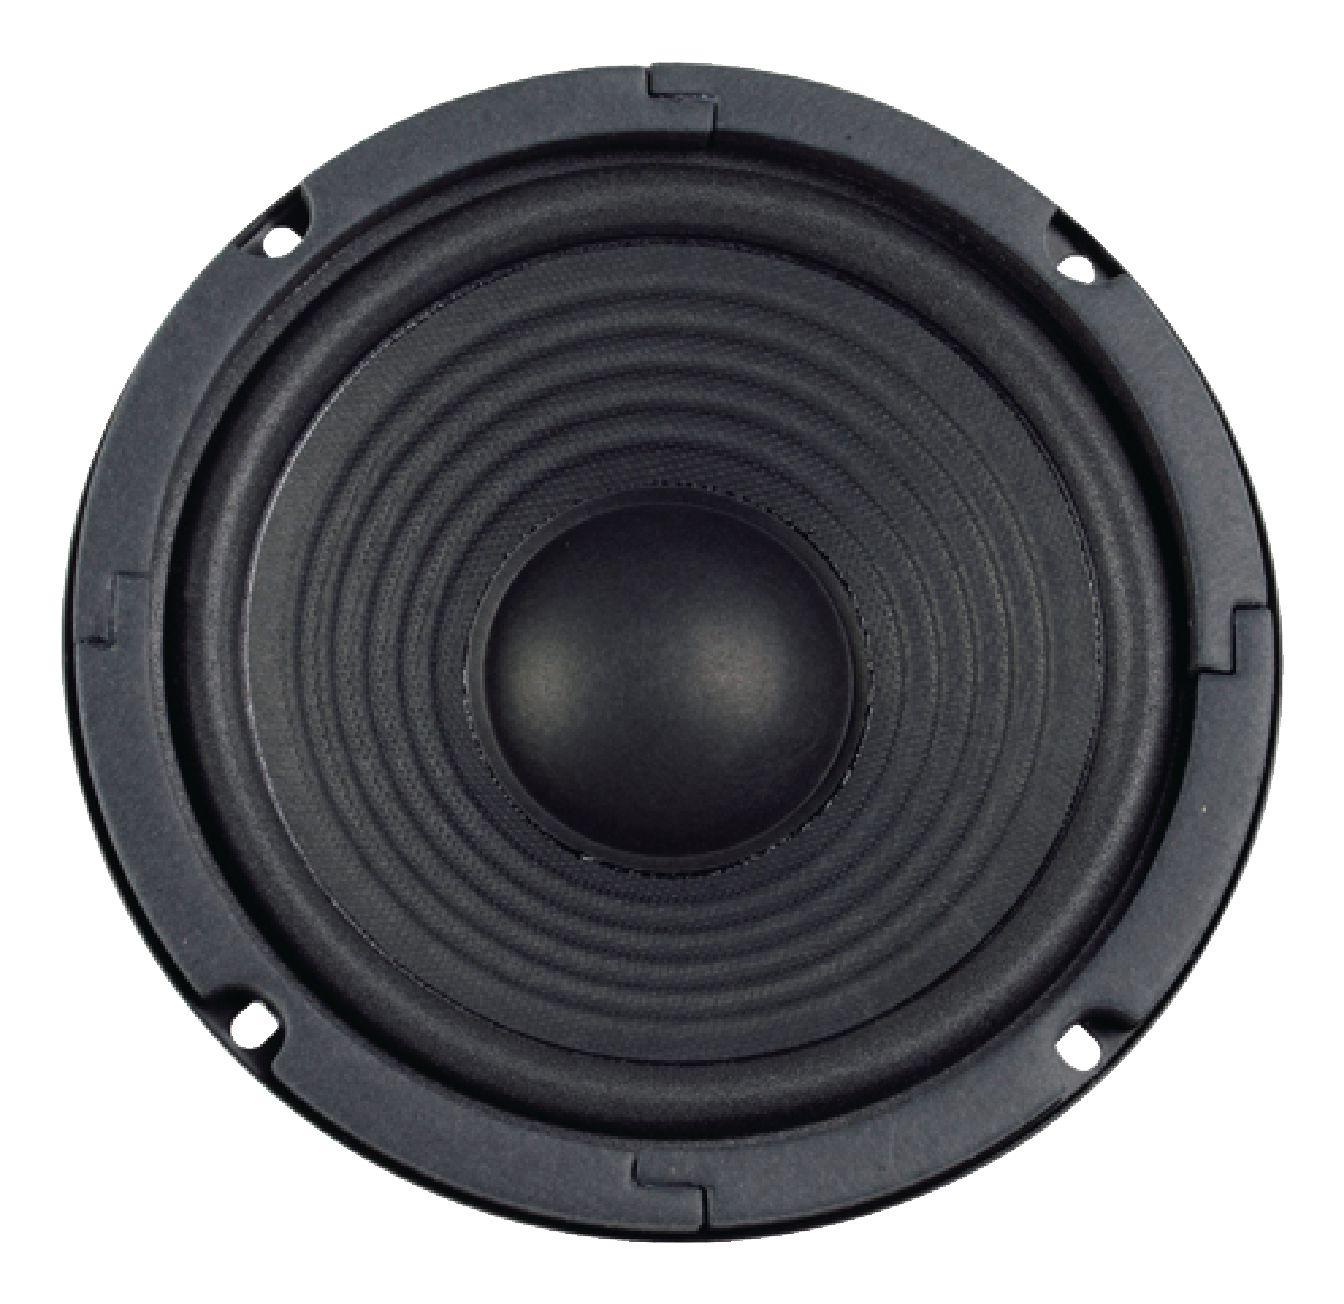 "Basový reproduktor 17 cm (6.5"" ) 8 Ohm 70 W Visaton, VS-W170/8"